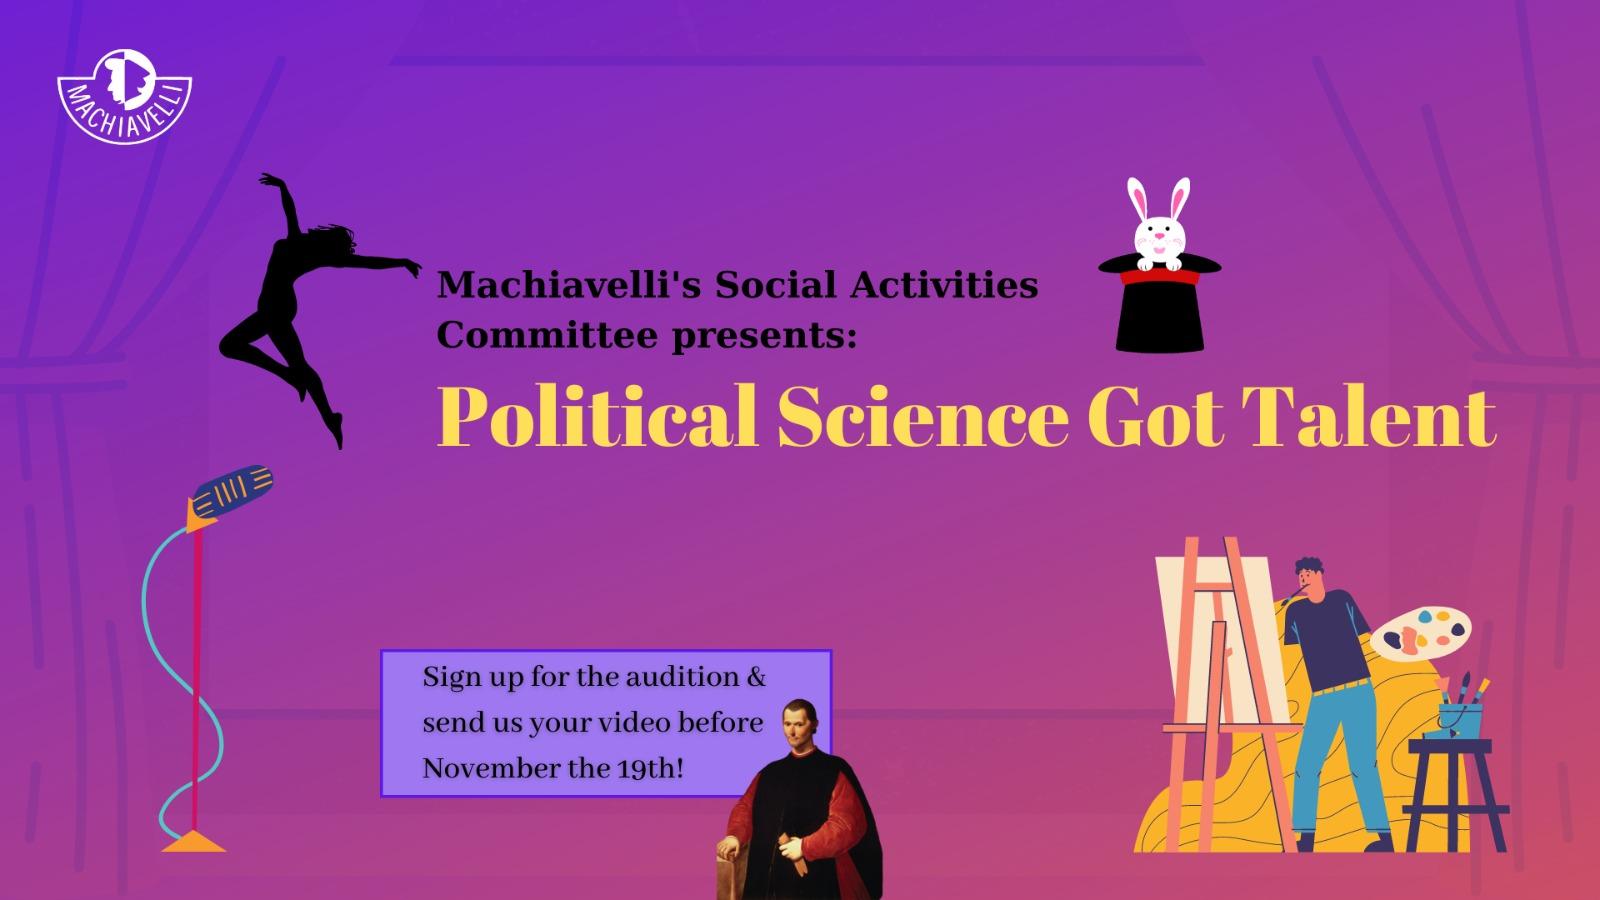 Political Science Got Talent (PSGT)